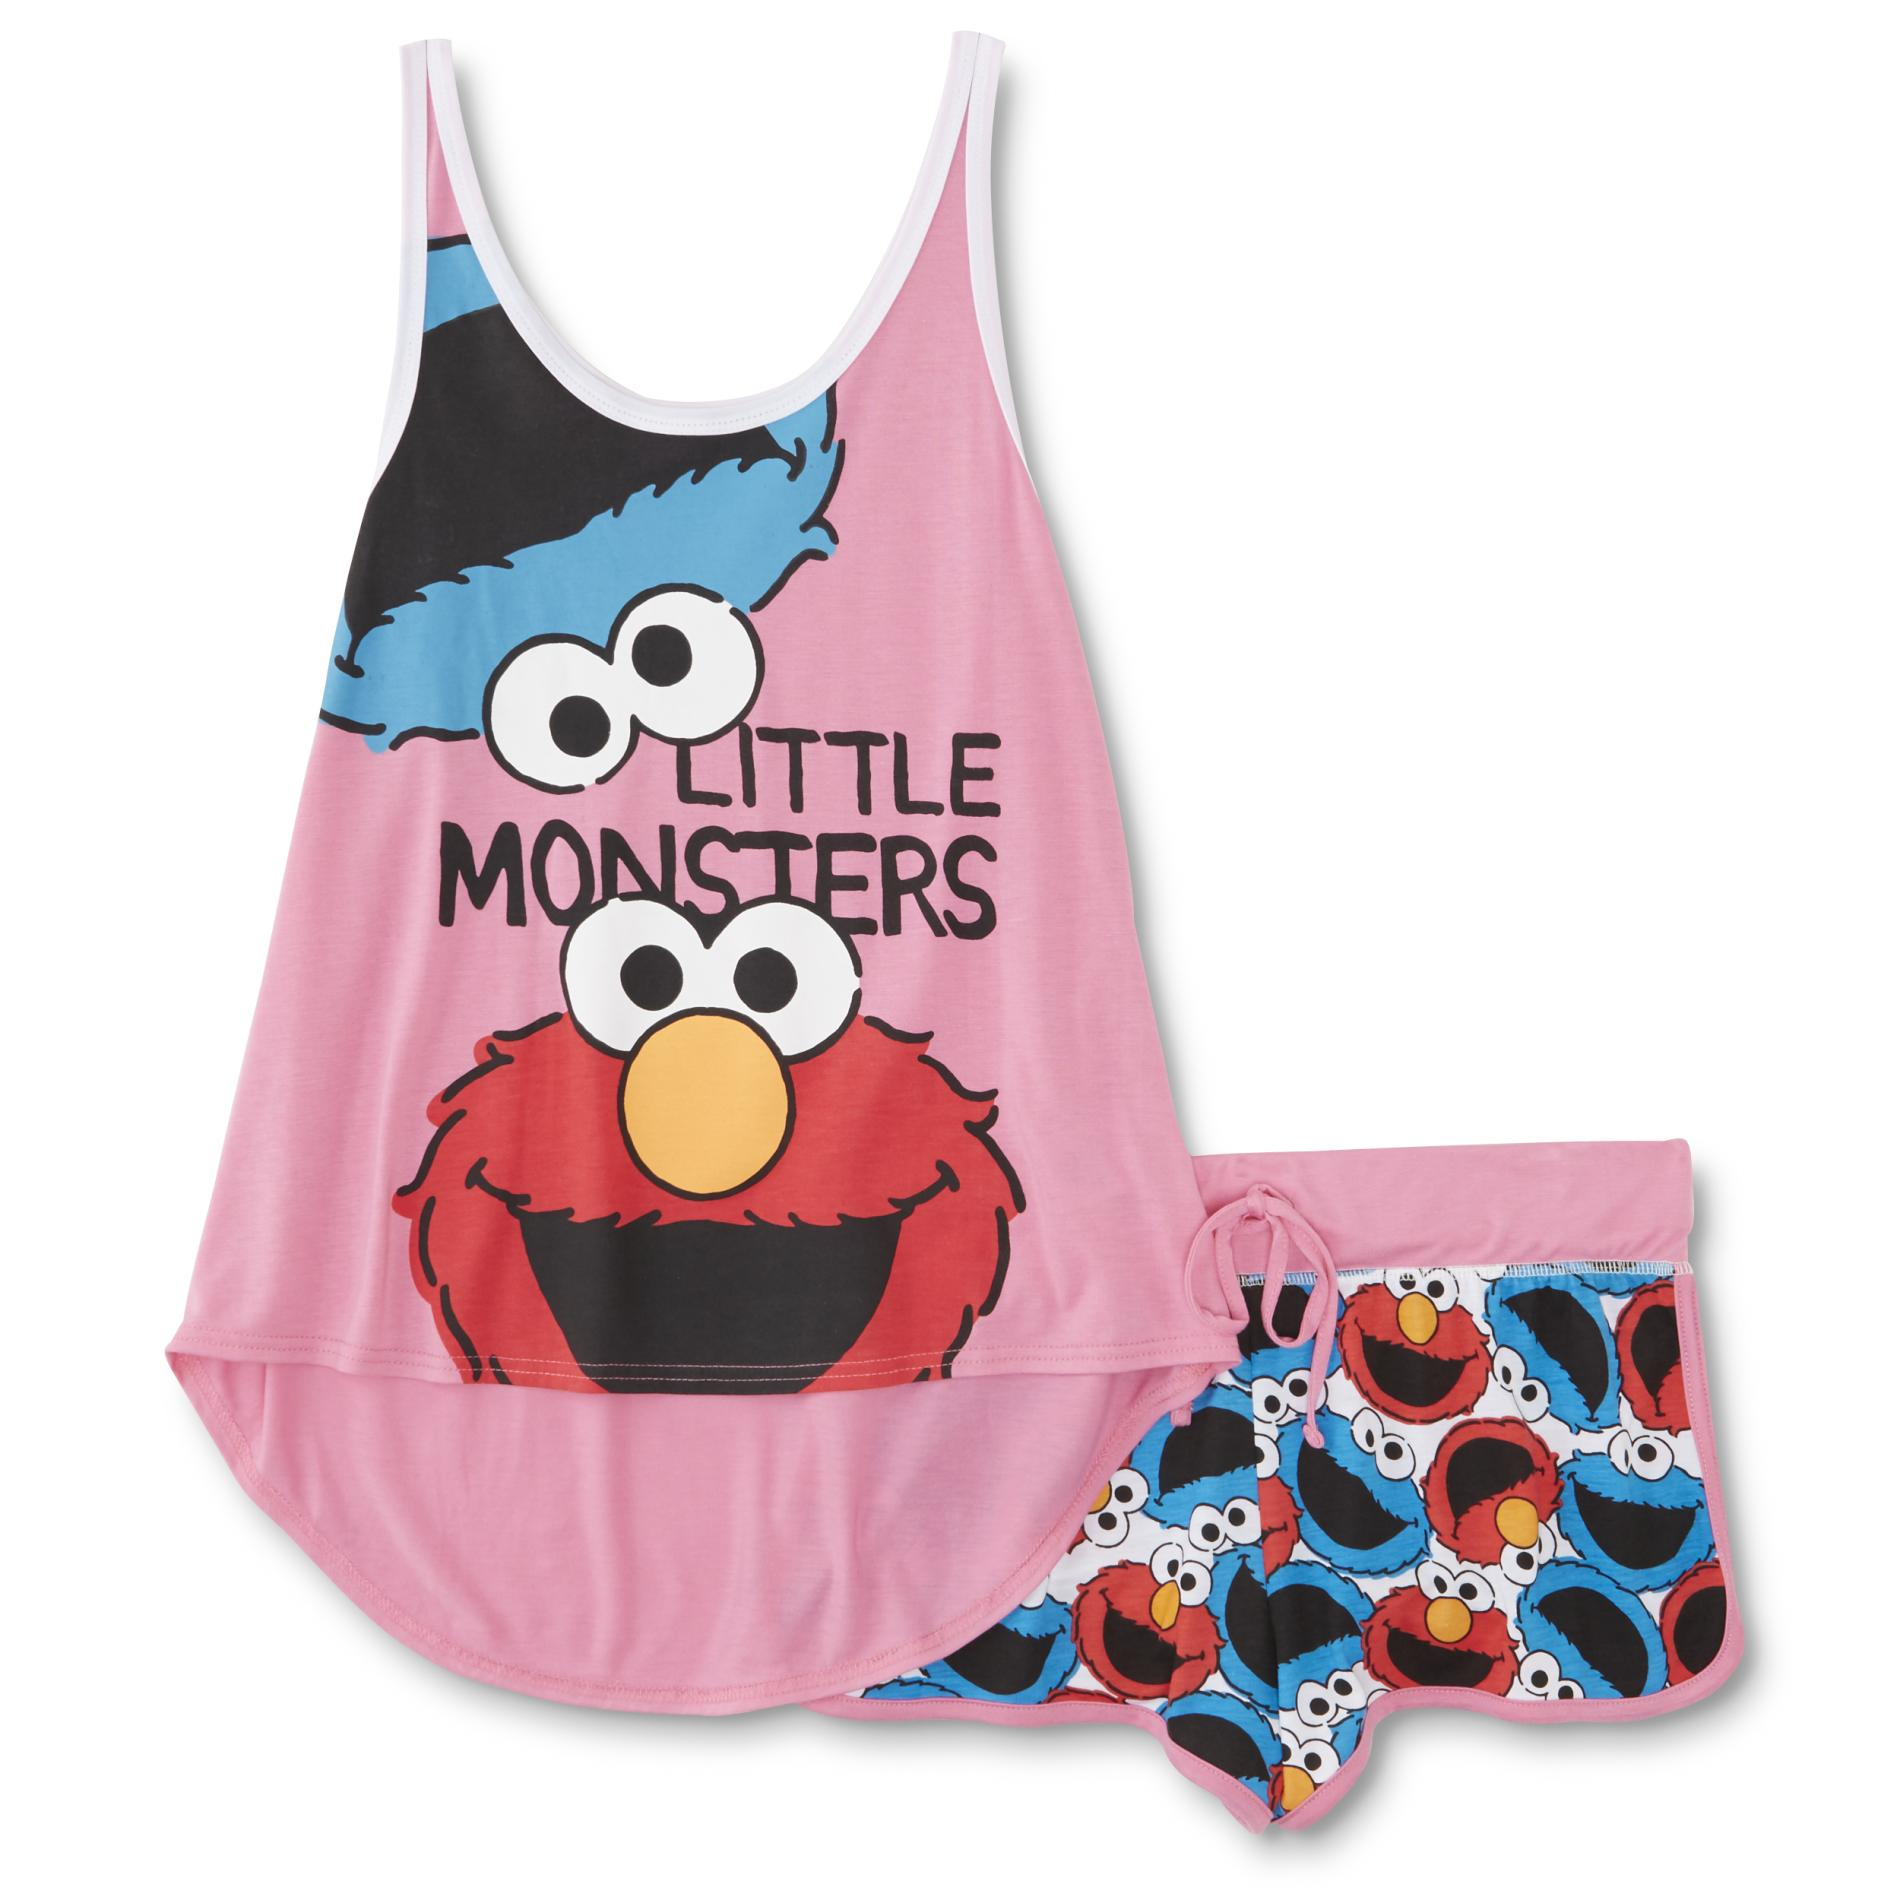 Sesame Street Cookie Monster & Elmo Women's Pajama Tank Top & Shorts